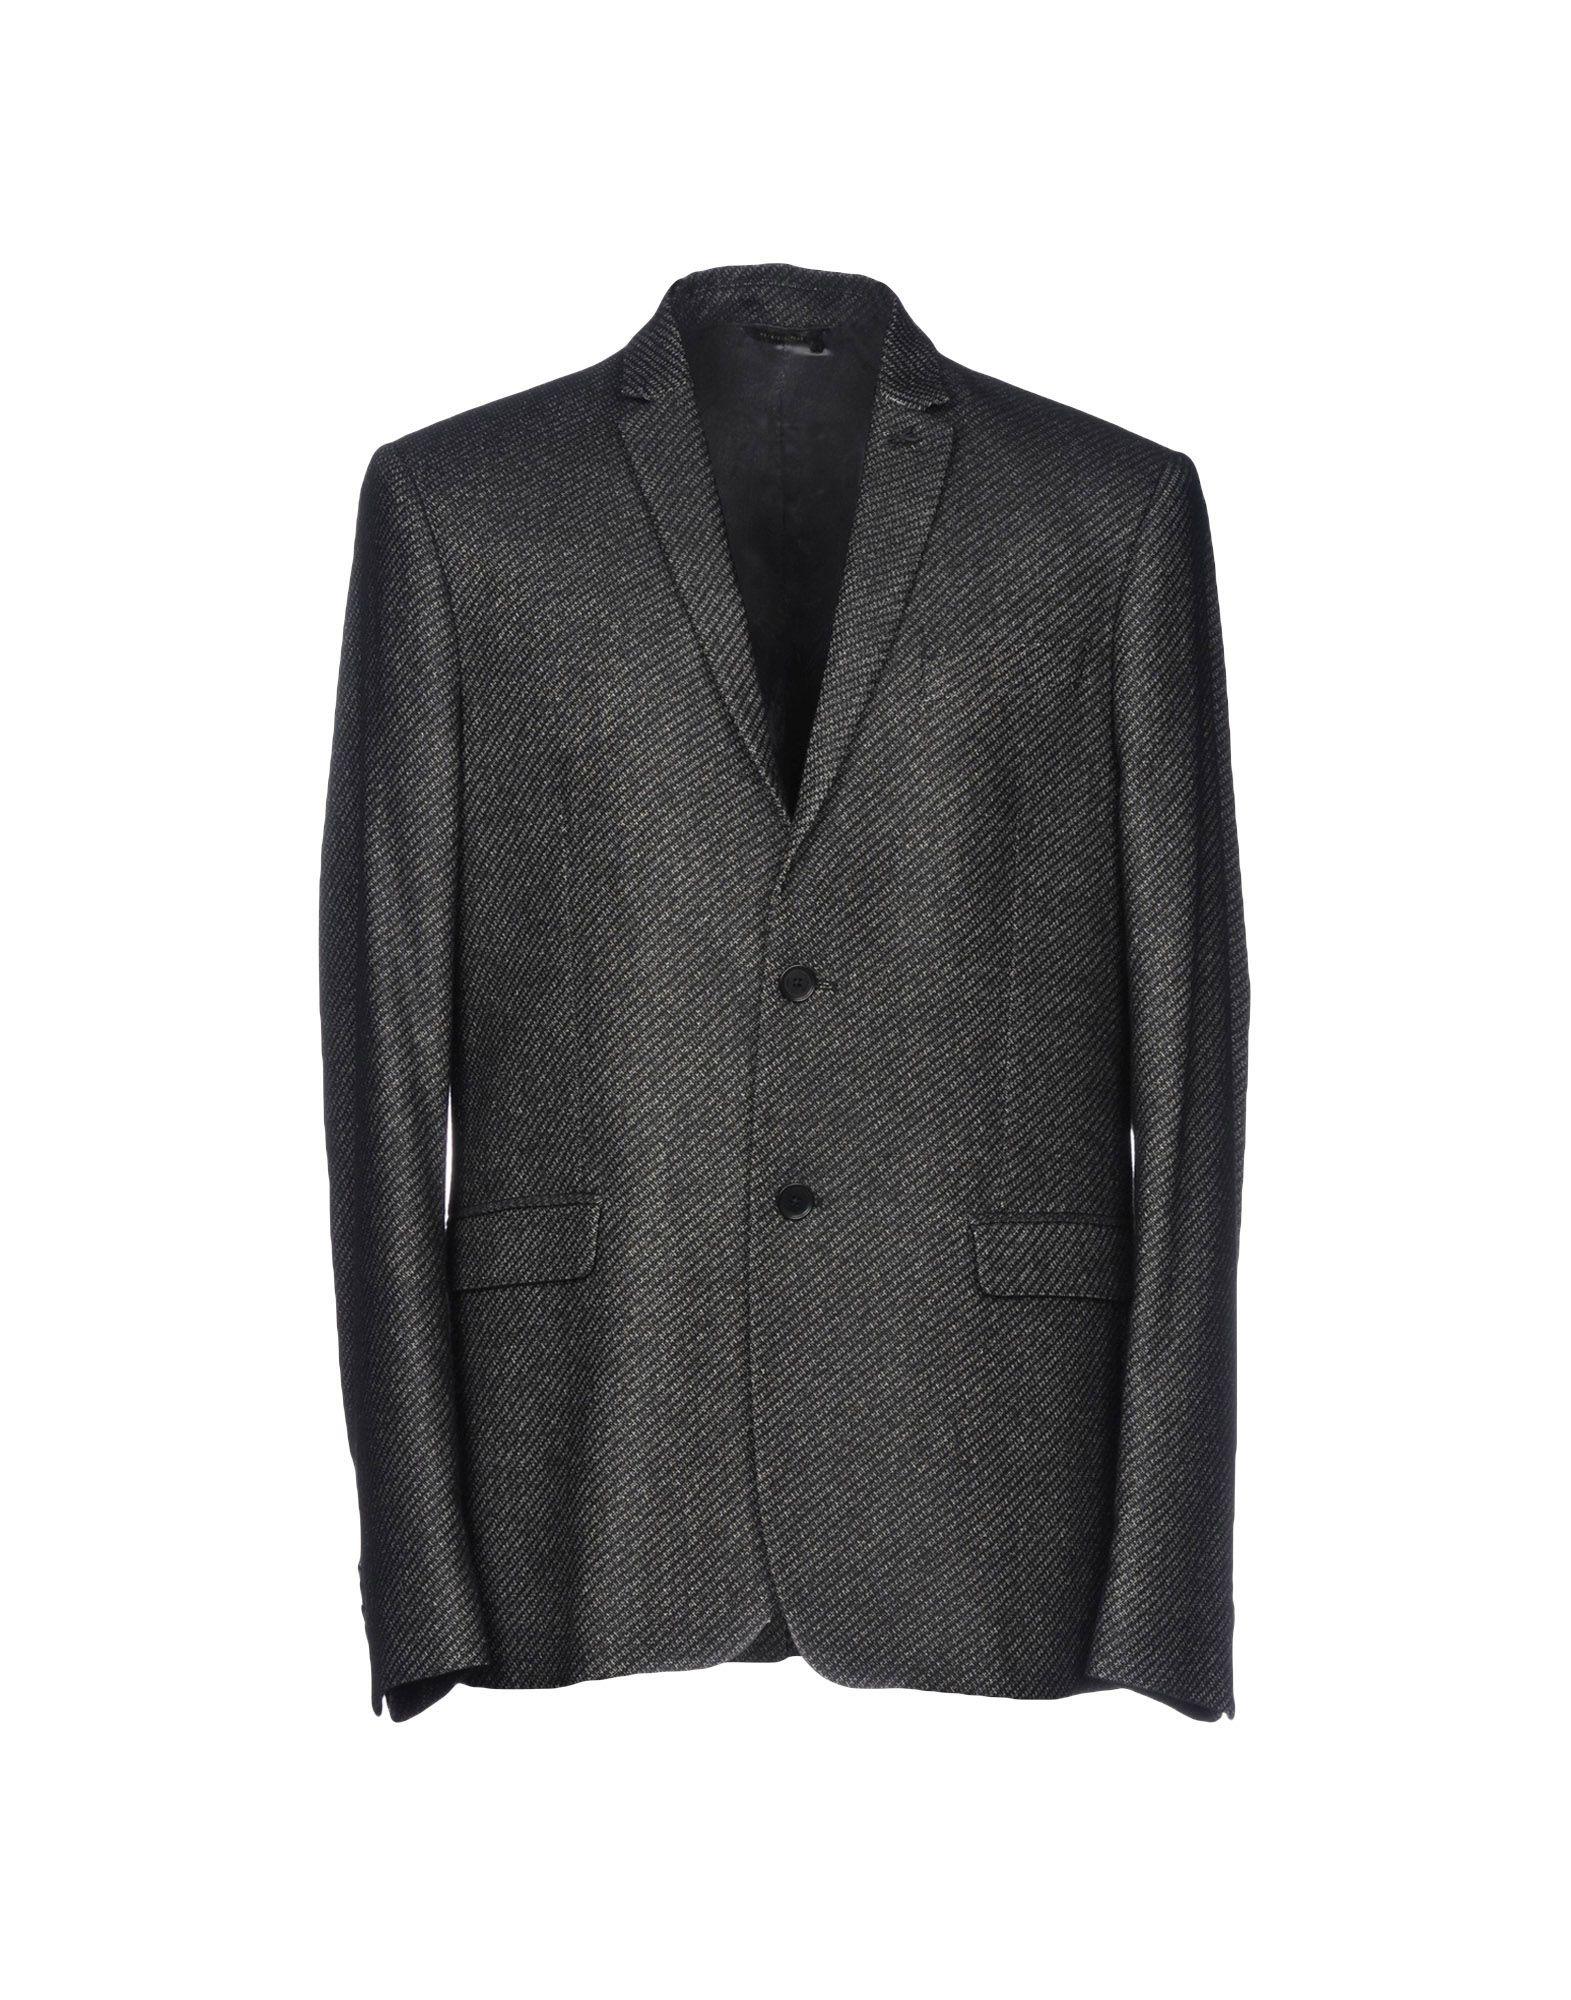 PATRIZIA PEPE Пиджак пиджак patrizia pepe пиджаки и жакеты длинные